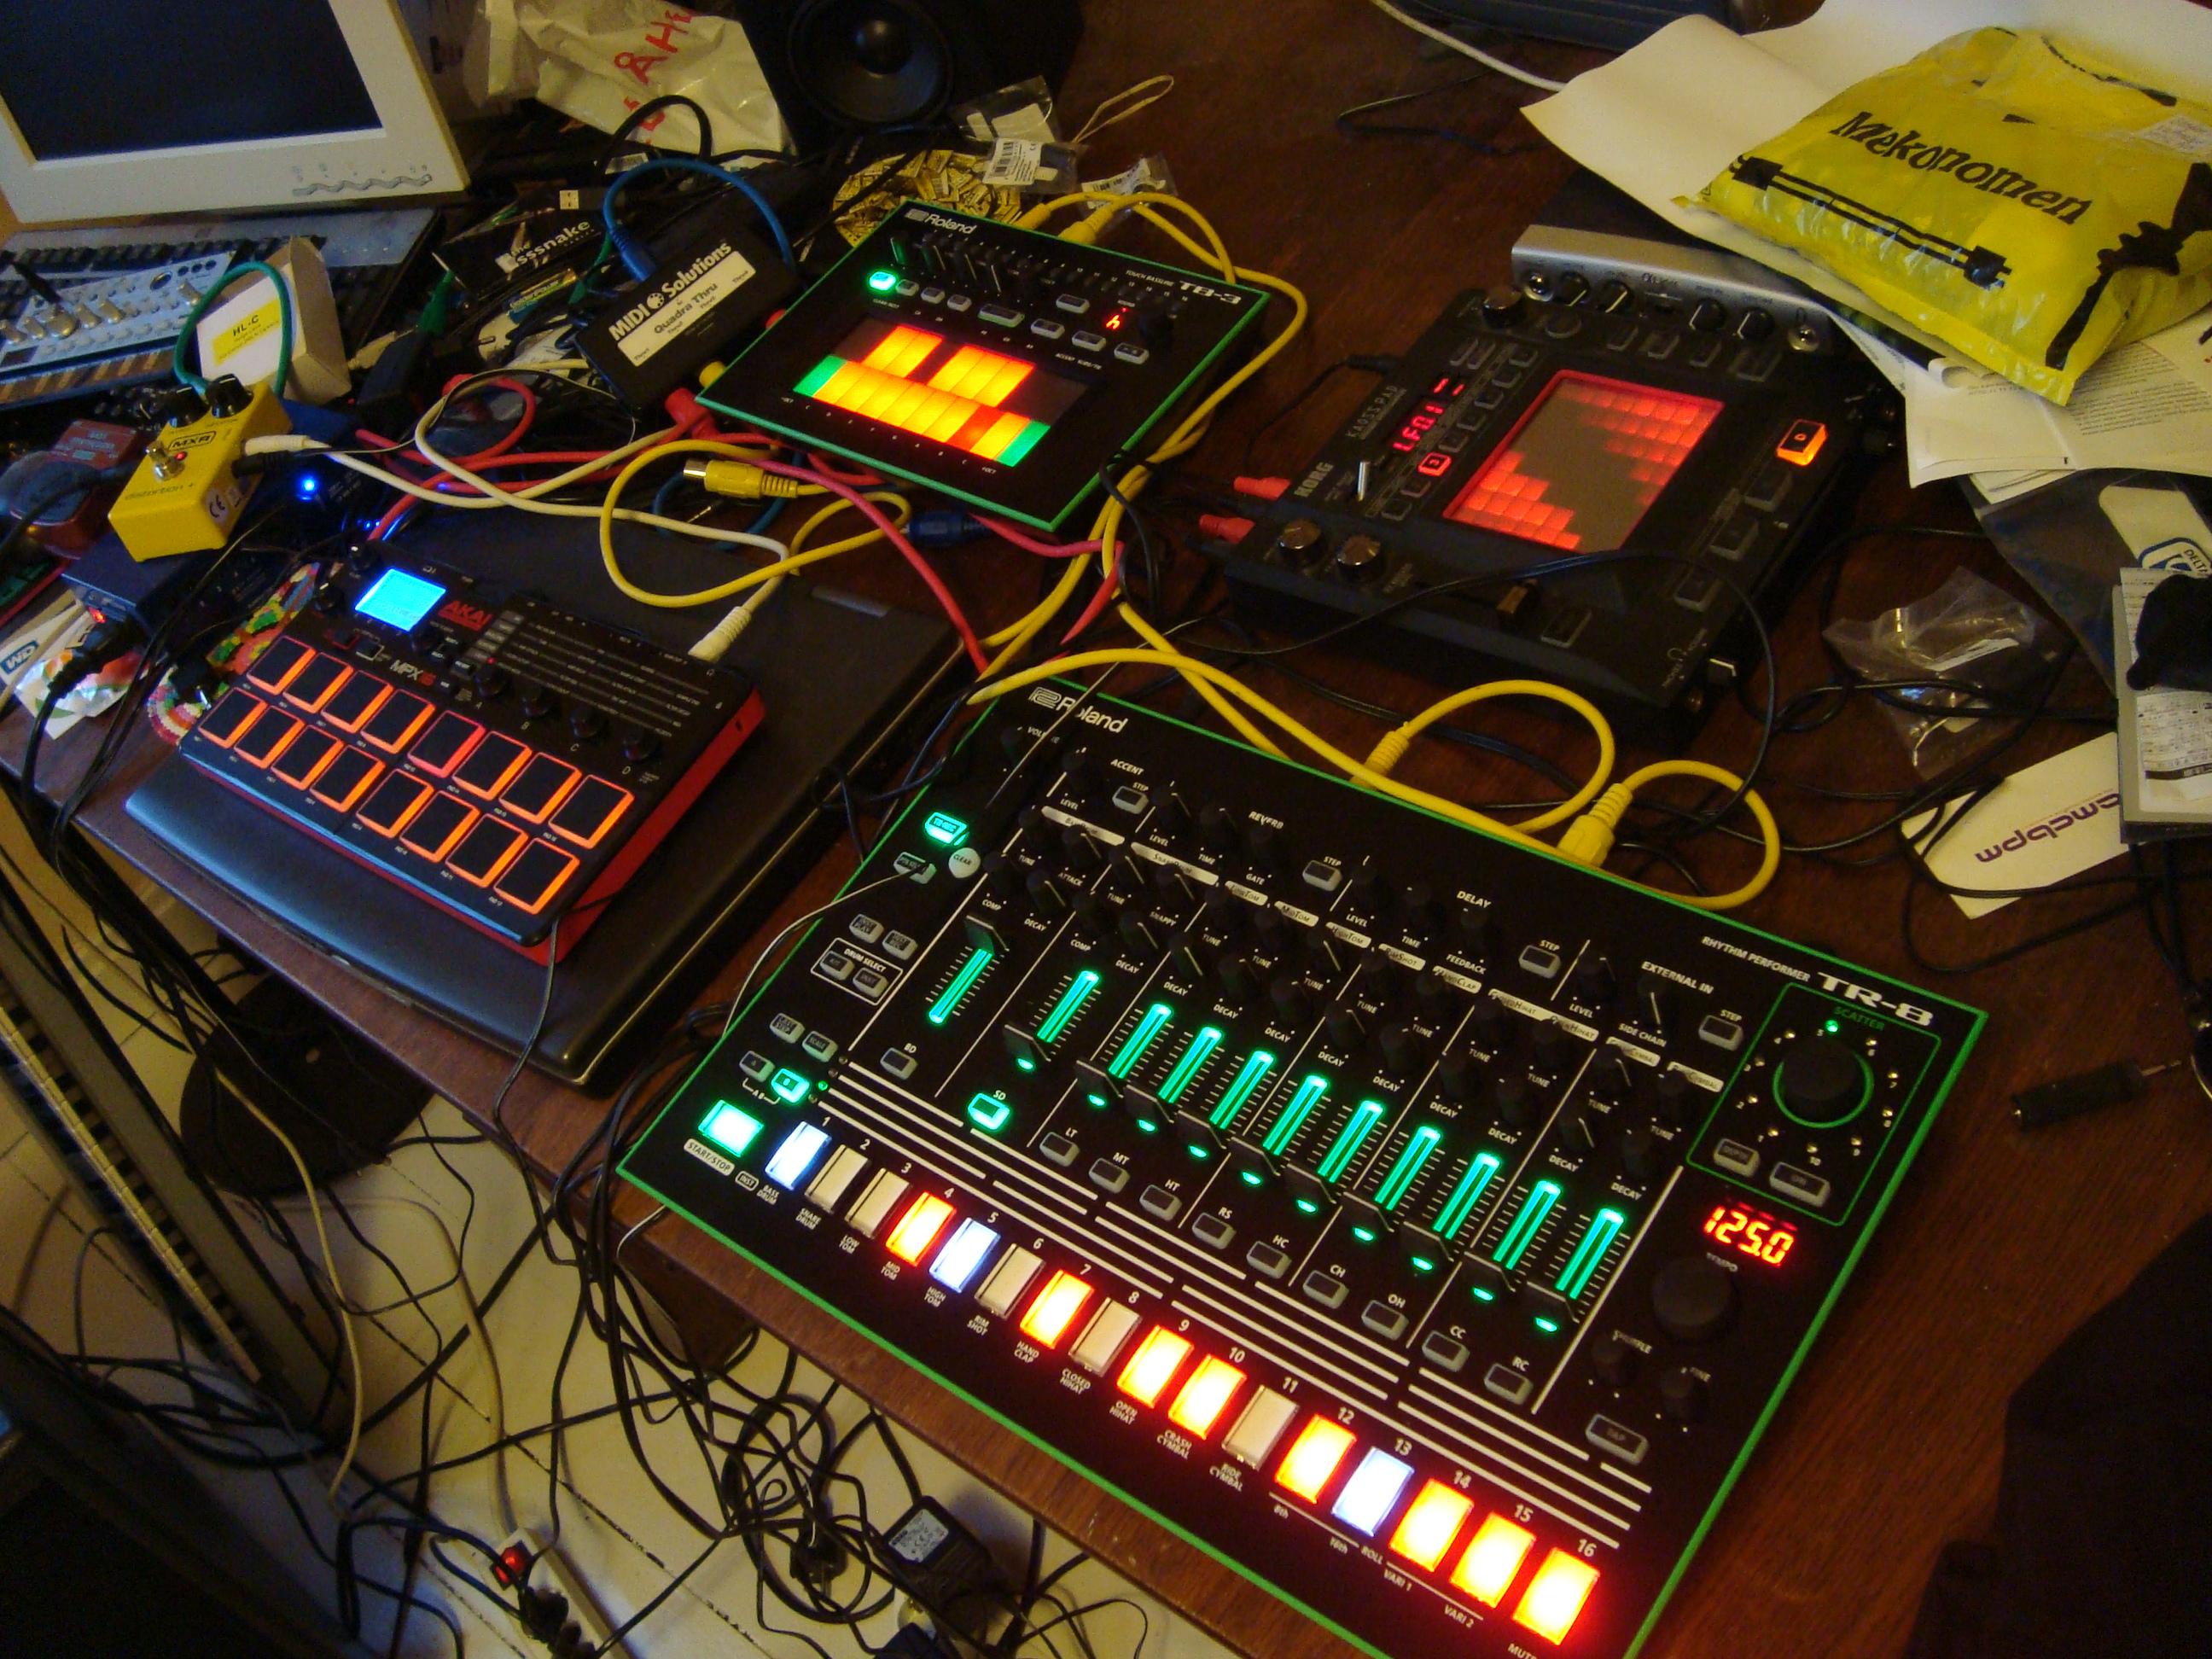 file musical toys korg volca bass roland aira tb 3 touch bassline akai mpx16 sampler roland. Black Bedroom Furniture Sets. Home Design Ideas